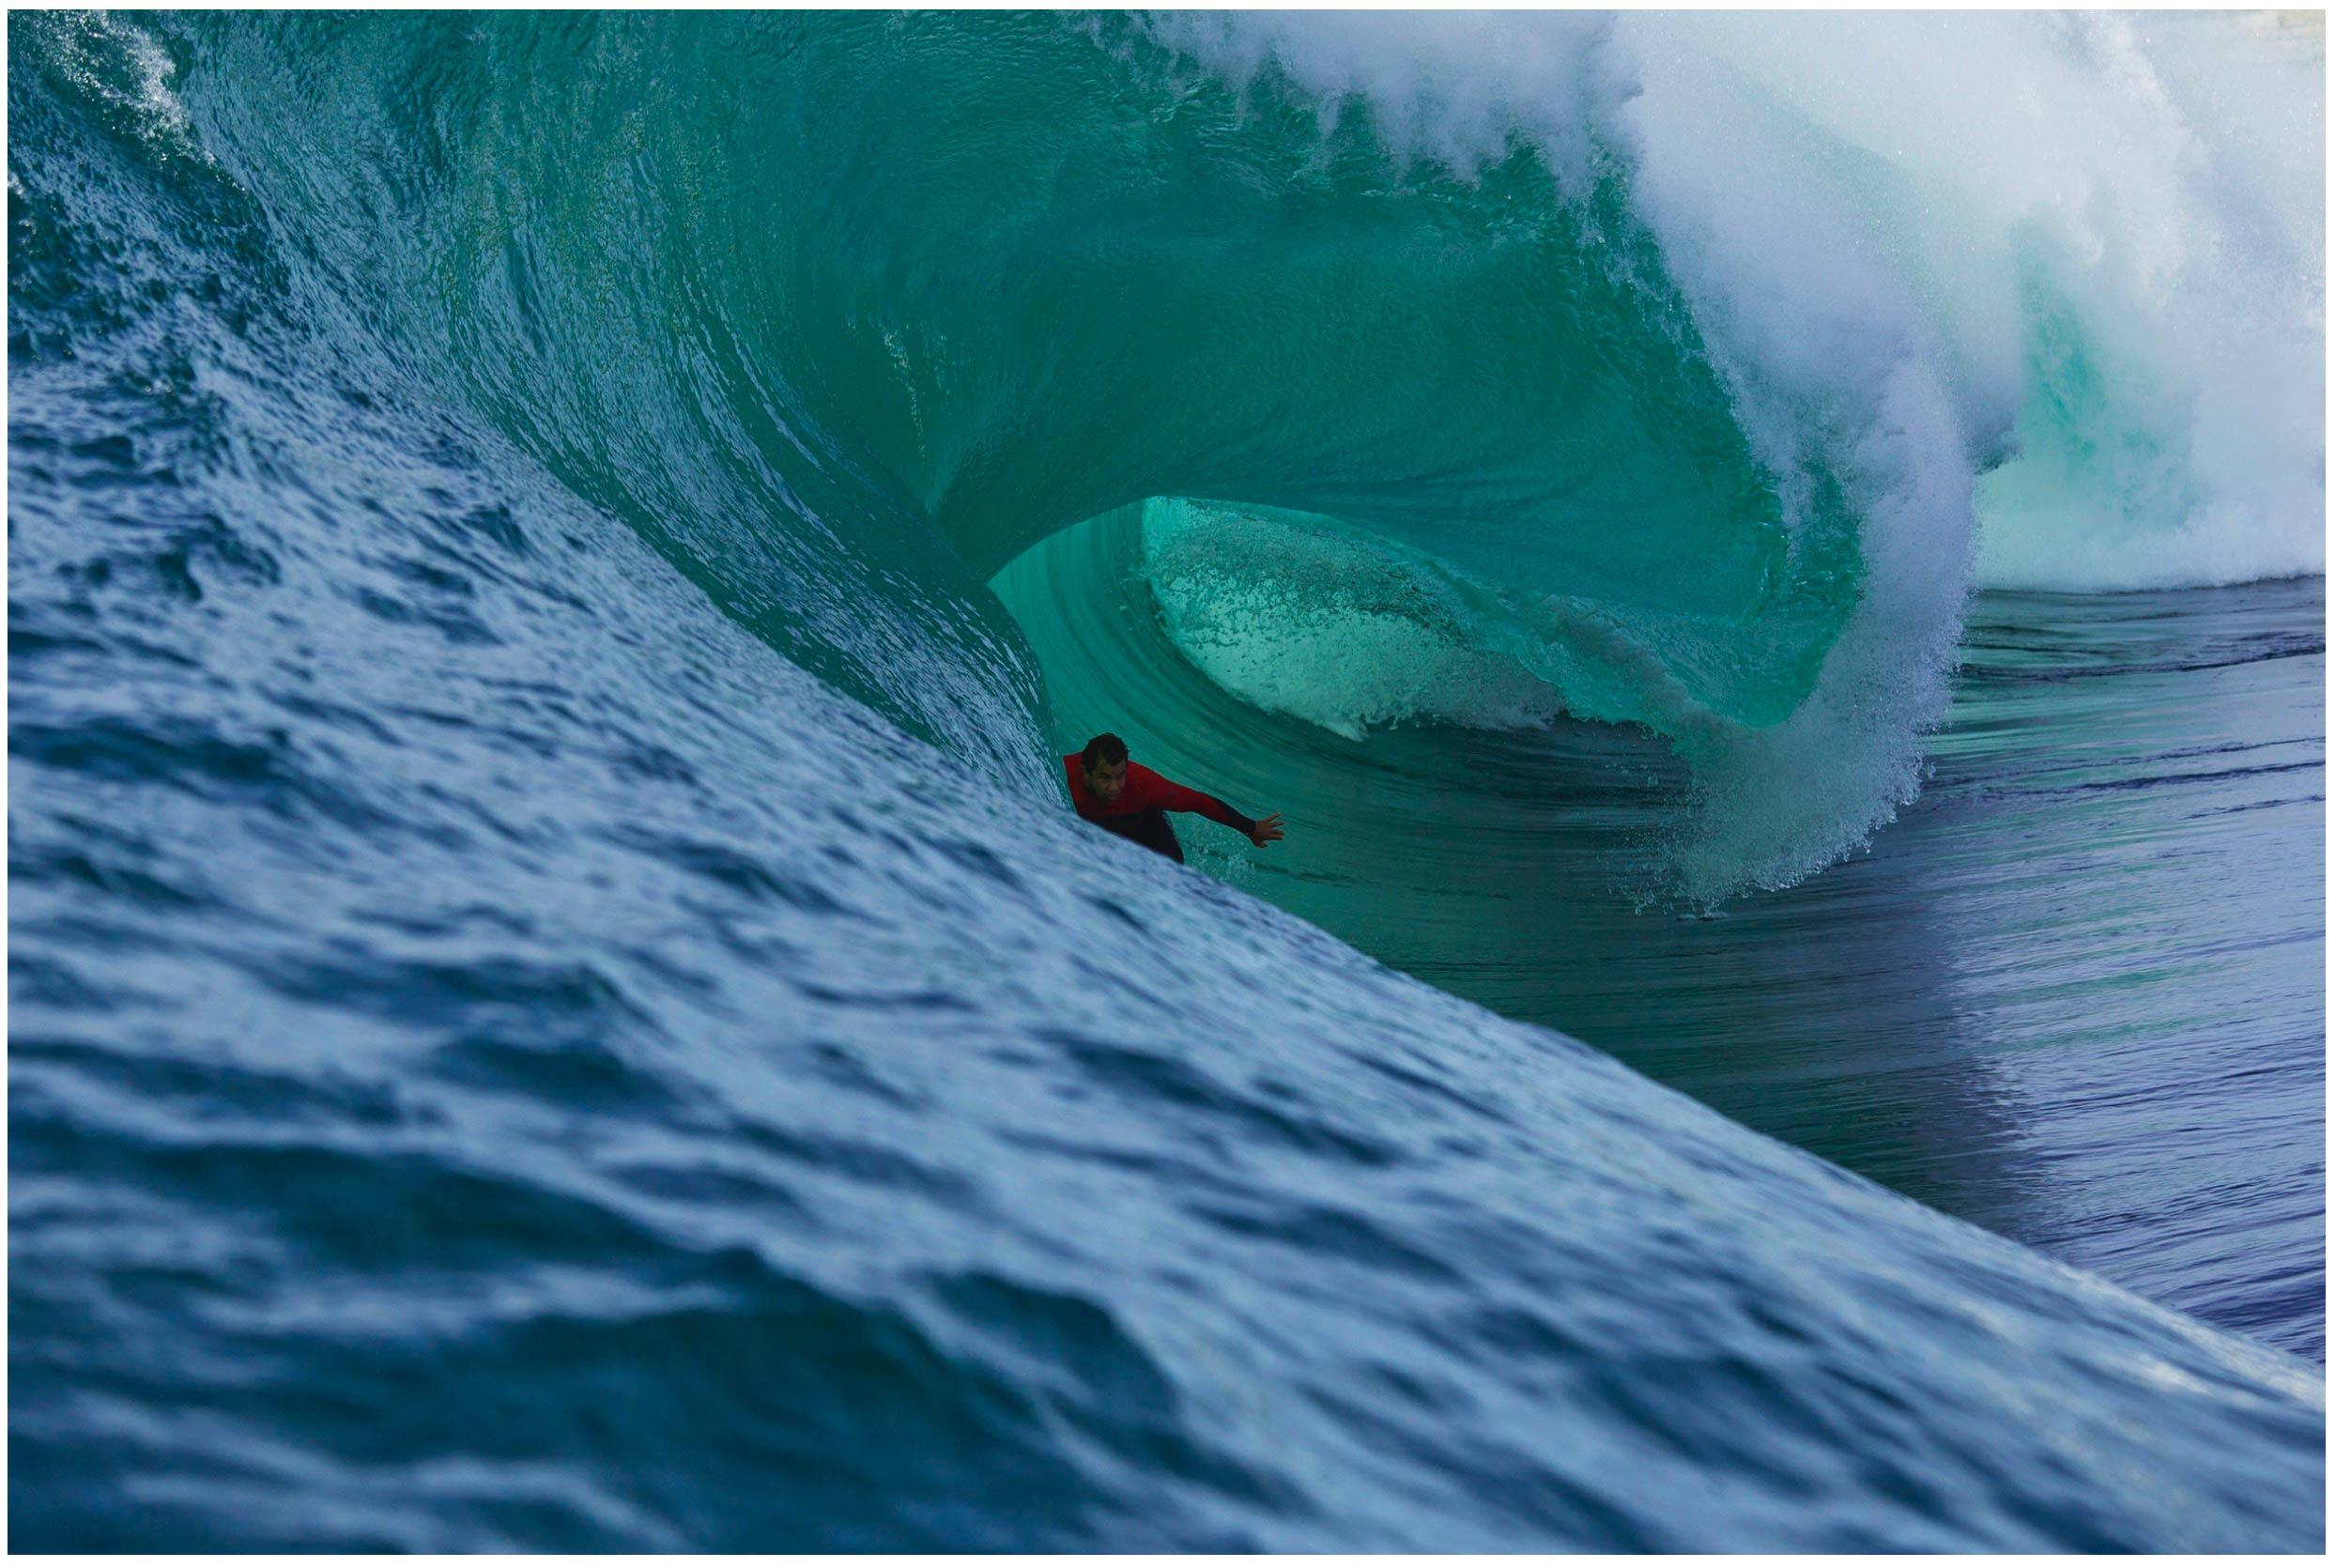 rodd-owen-surf-photography-for-sale-owenphoto-259.jpg